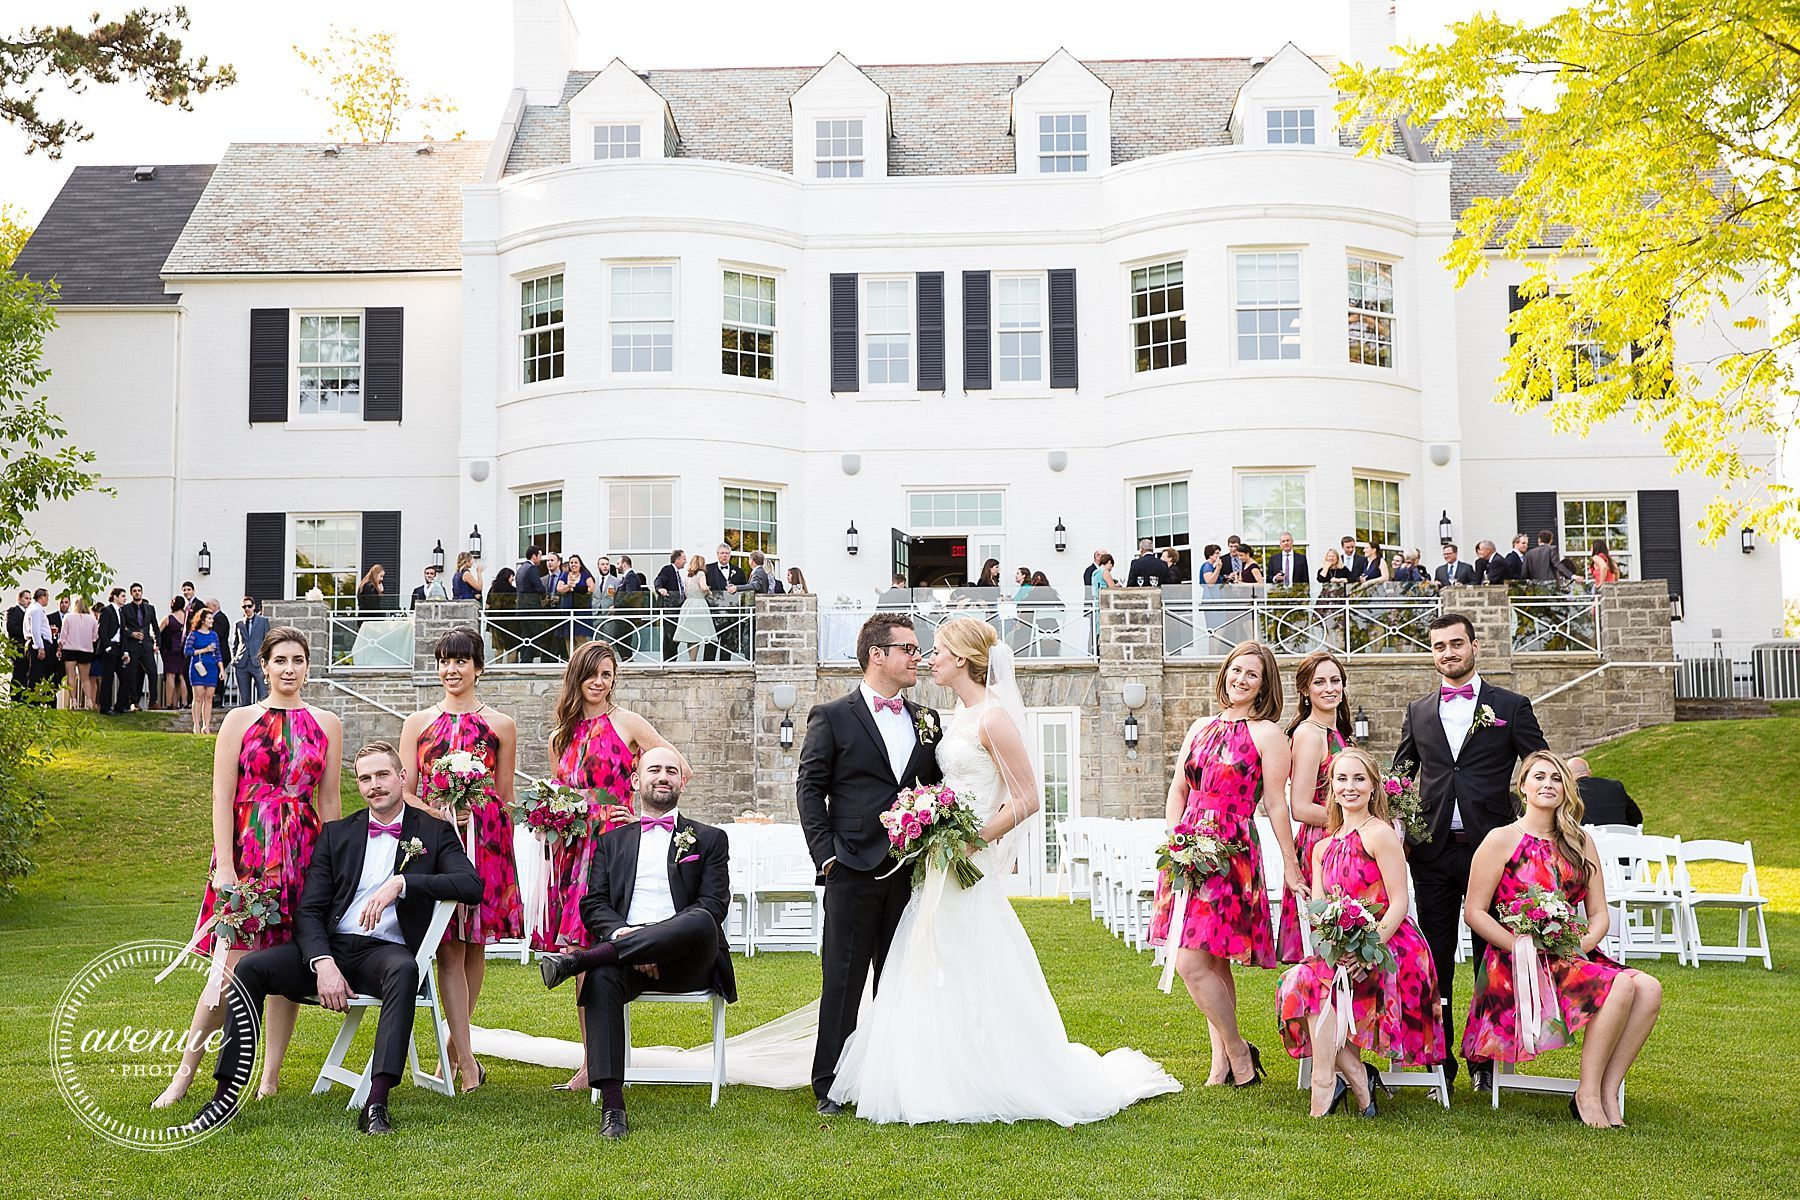 Holcim estates - mississauga   Wedding Ideas - Tarek   Pinterest ...